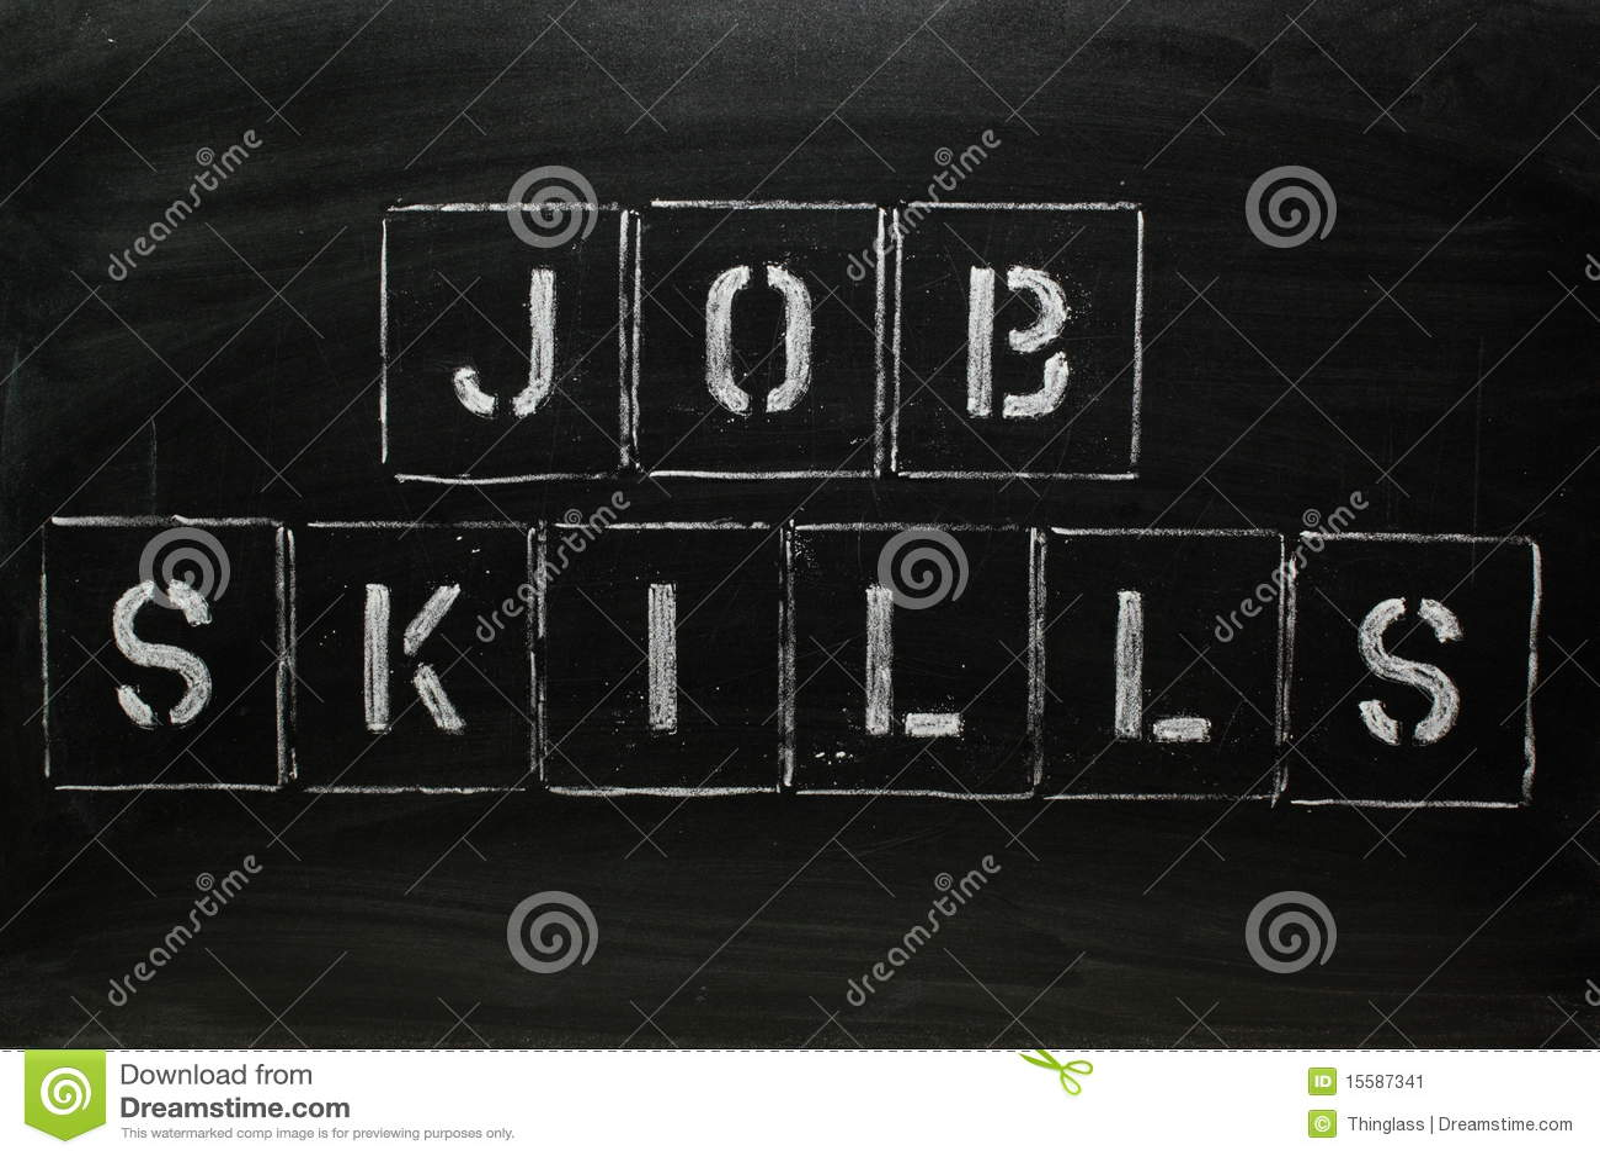 job skills stock image image 15587341 job skills